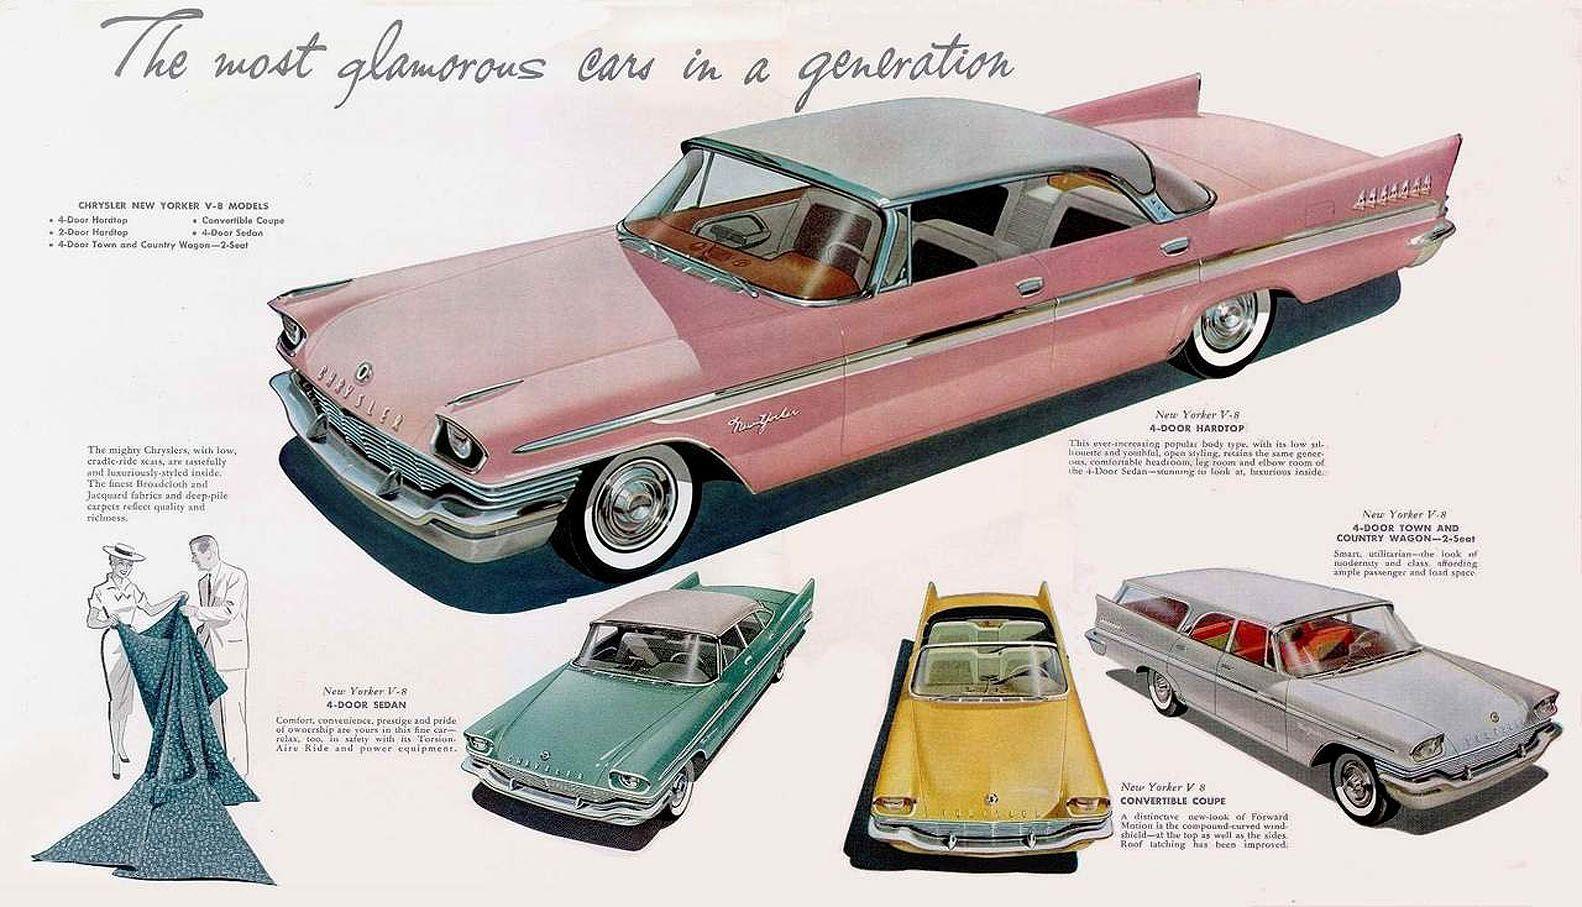 1957 chrysler  | Directory Index: Chrysler_and_Imperial/1957_Chrysler/1957_Chrysler ...